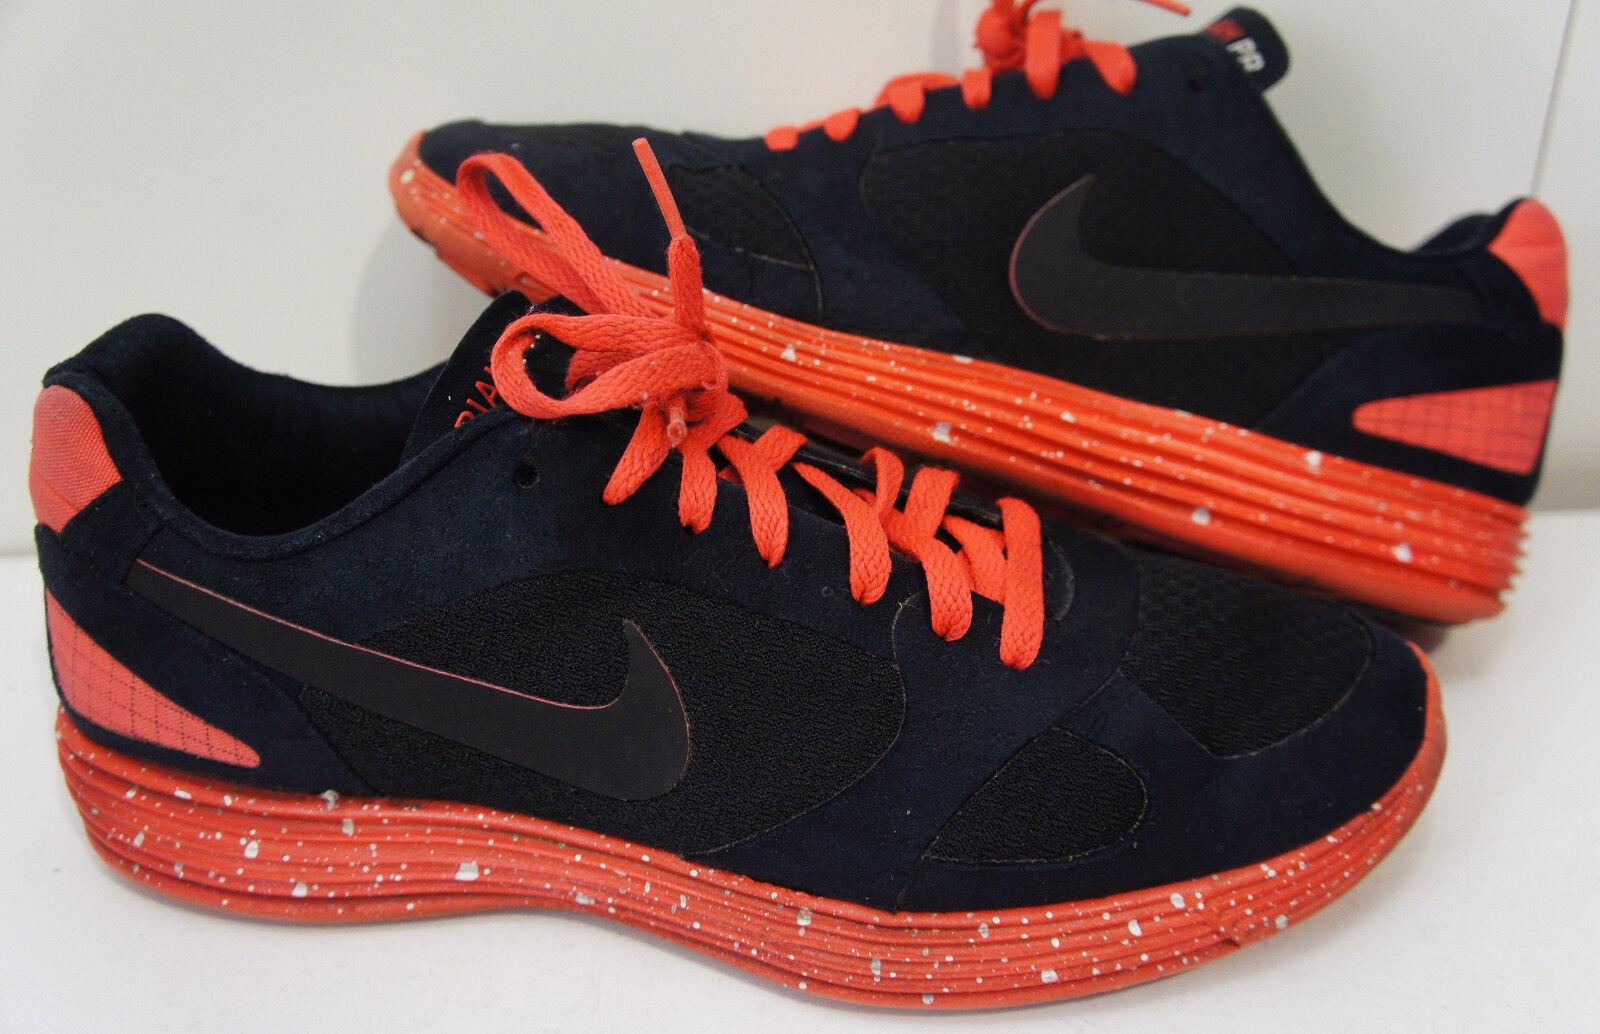 2009 Nike Lunar lunarlon Mariah PR TZ Hot Red Black Lava 369187-003 SZ 11